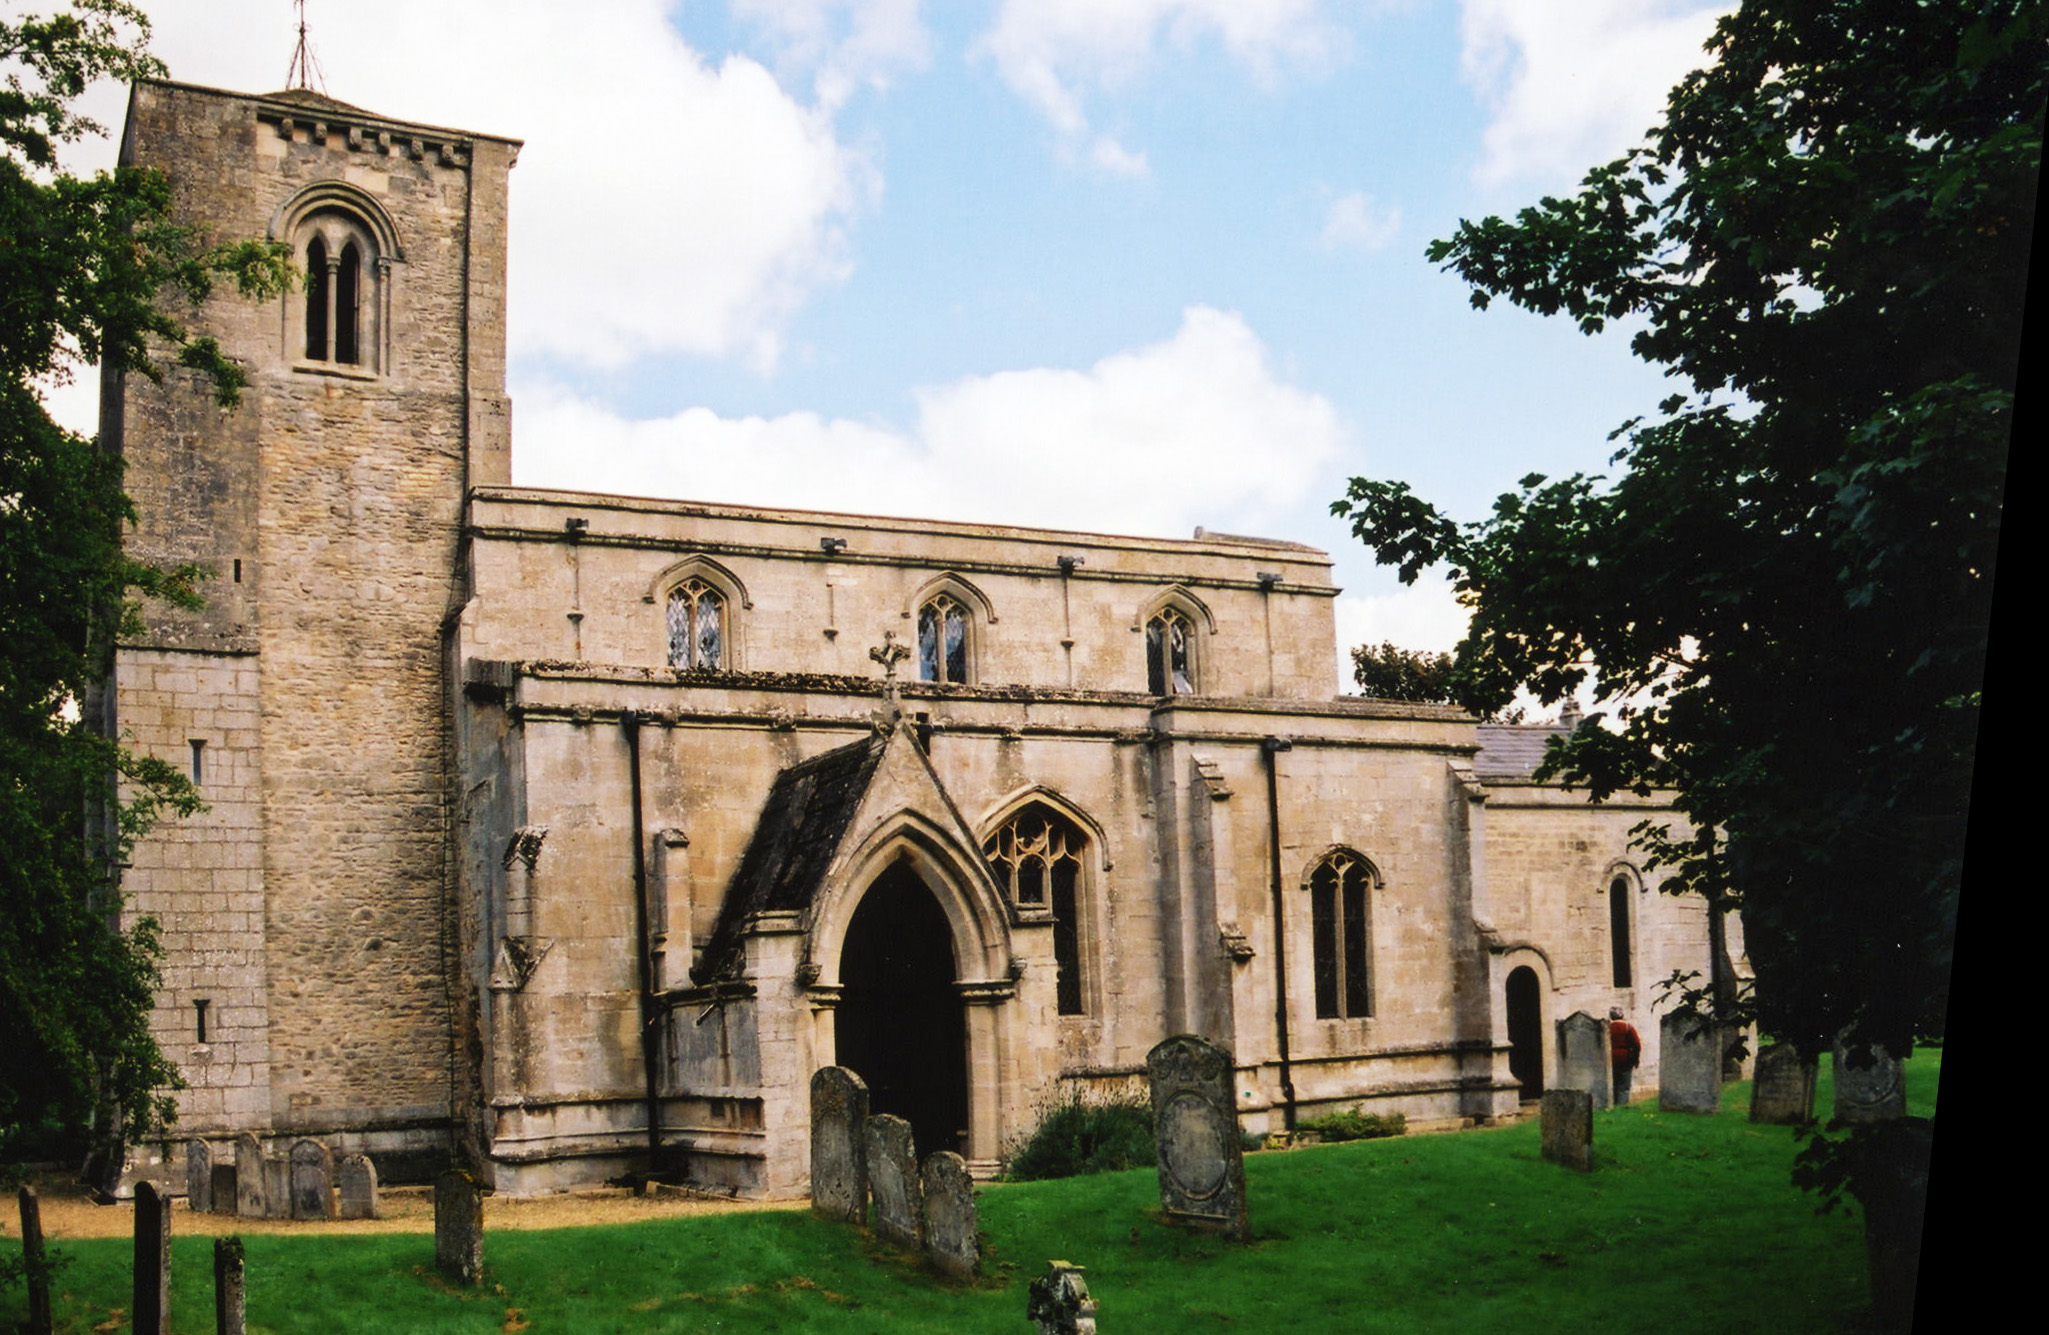 Careby St. Stephen